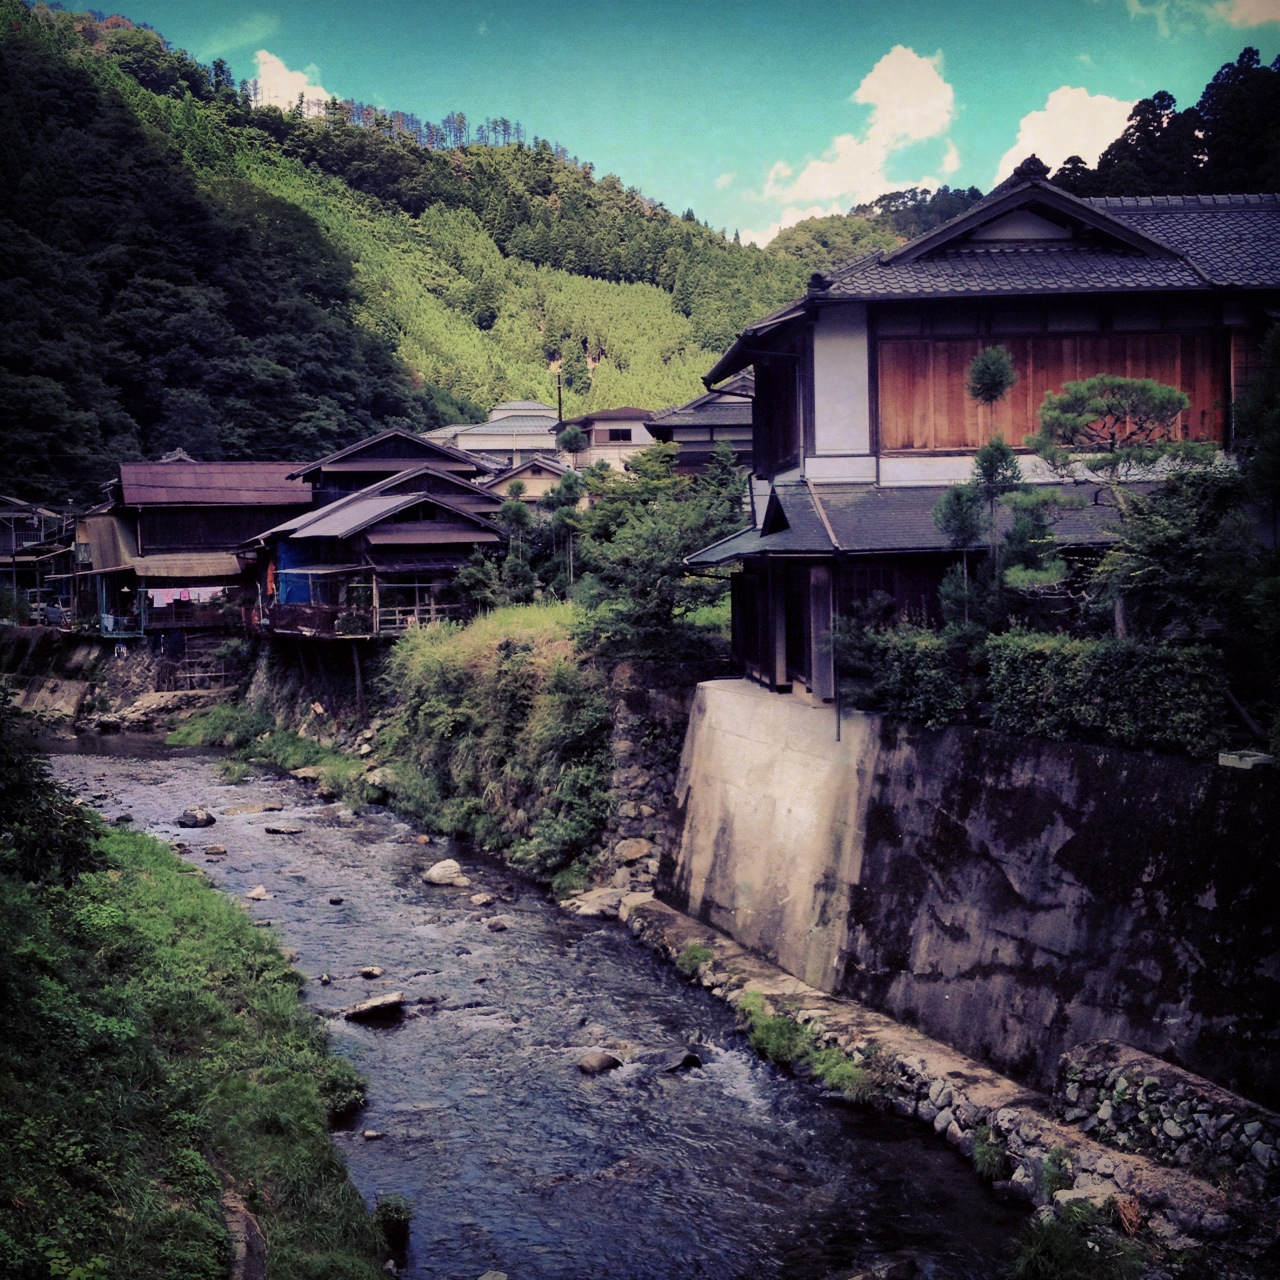 programme randonnn e dans la vall e de la kiyotakigawa nippon de emi. Black Bedroom Furniture Sets. Home Design Ideas